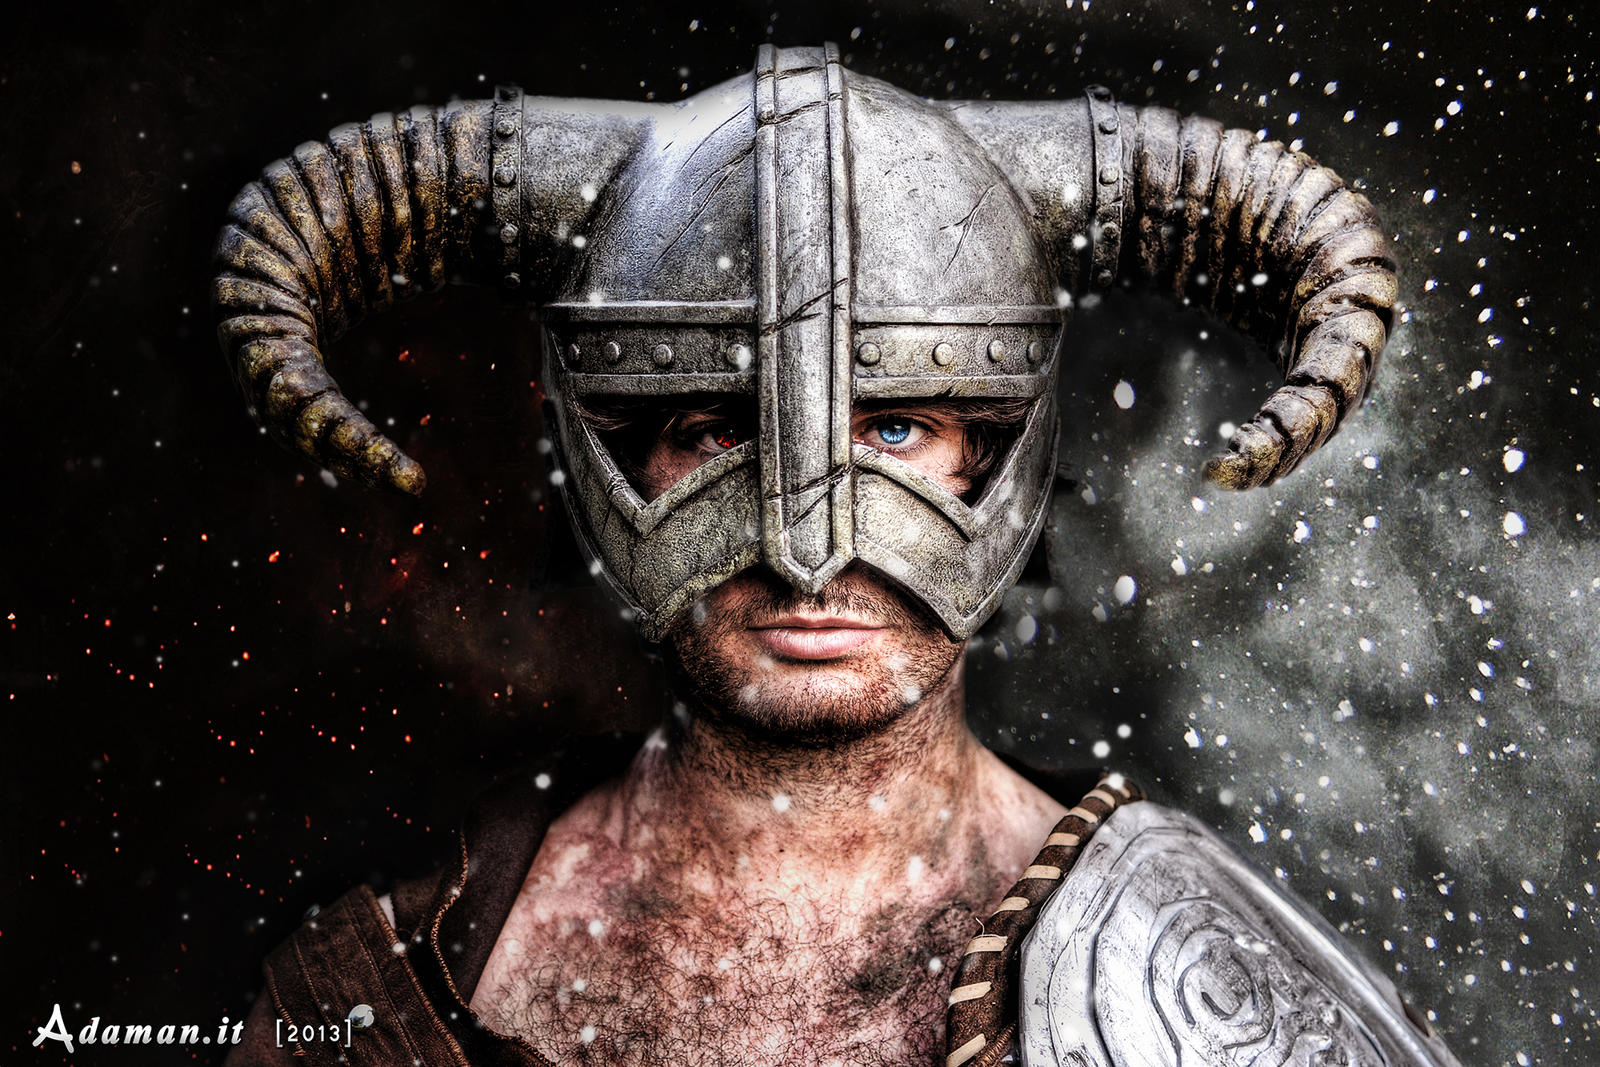 Skyrim - Dovahkiin Helmet by adaman77